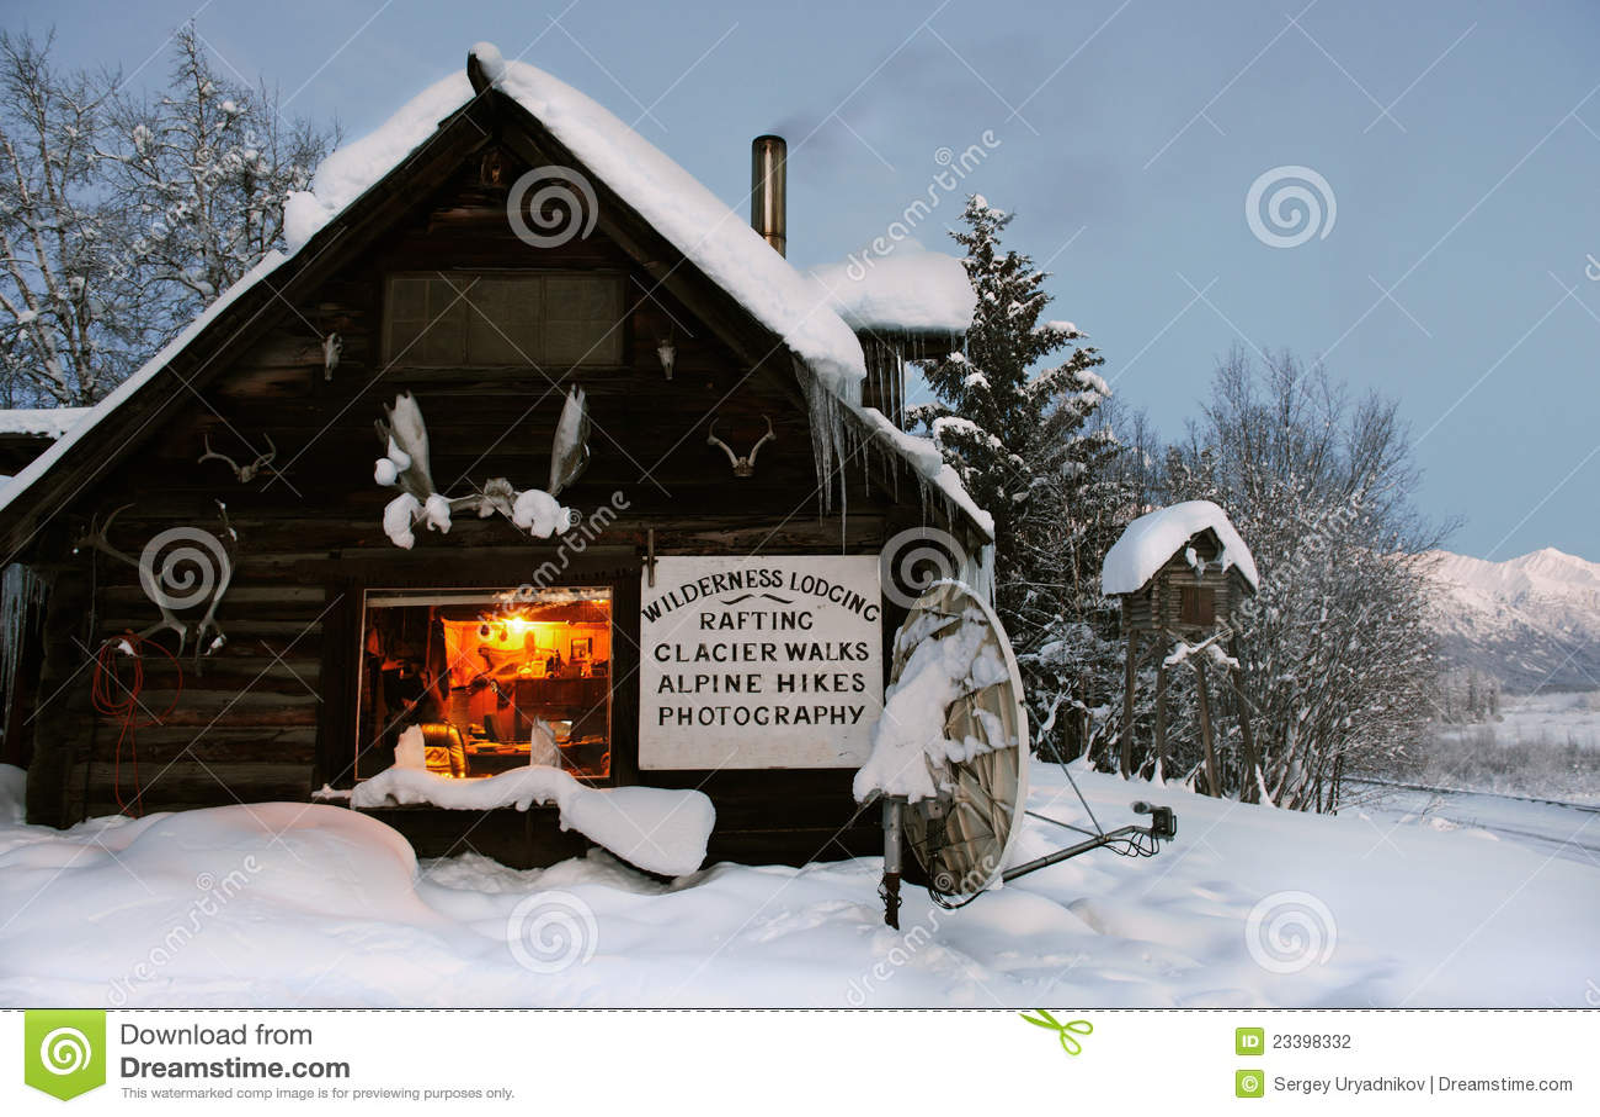 Stock Photography Log Cabin Wilds Alaska Usa Image23398332 on Small Rustic Cabin Home Plans